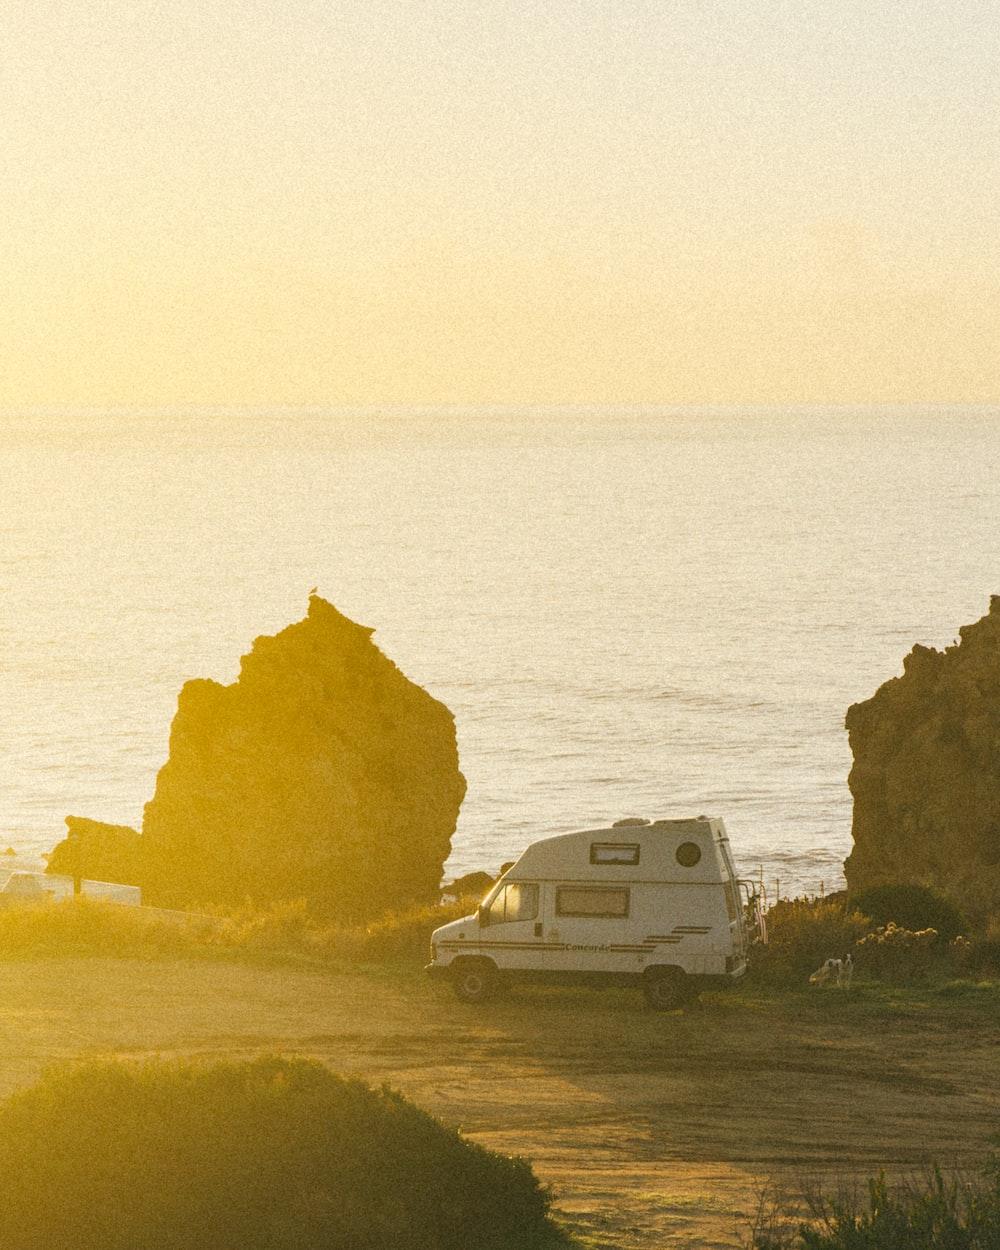 white motorhome near cliff during daytime